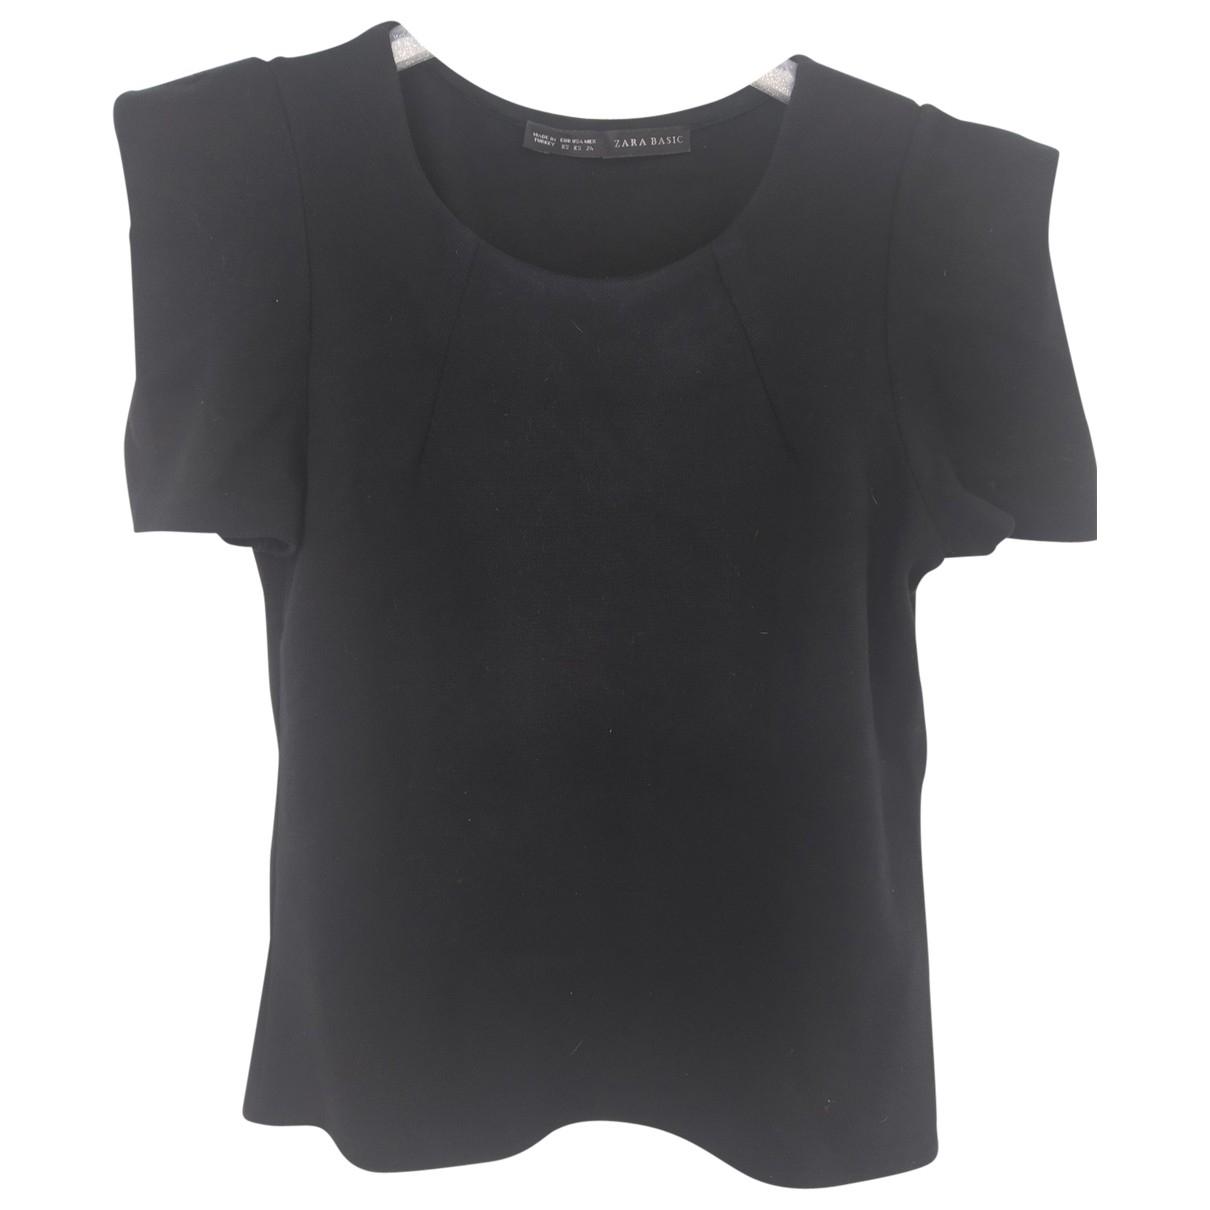 Zara \N Black Cotton  top for Women XS International